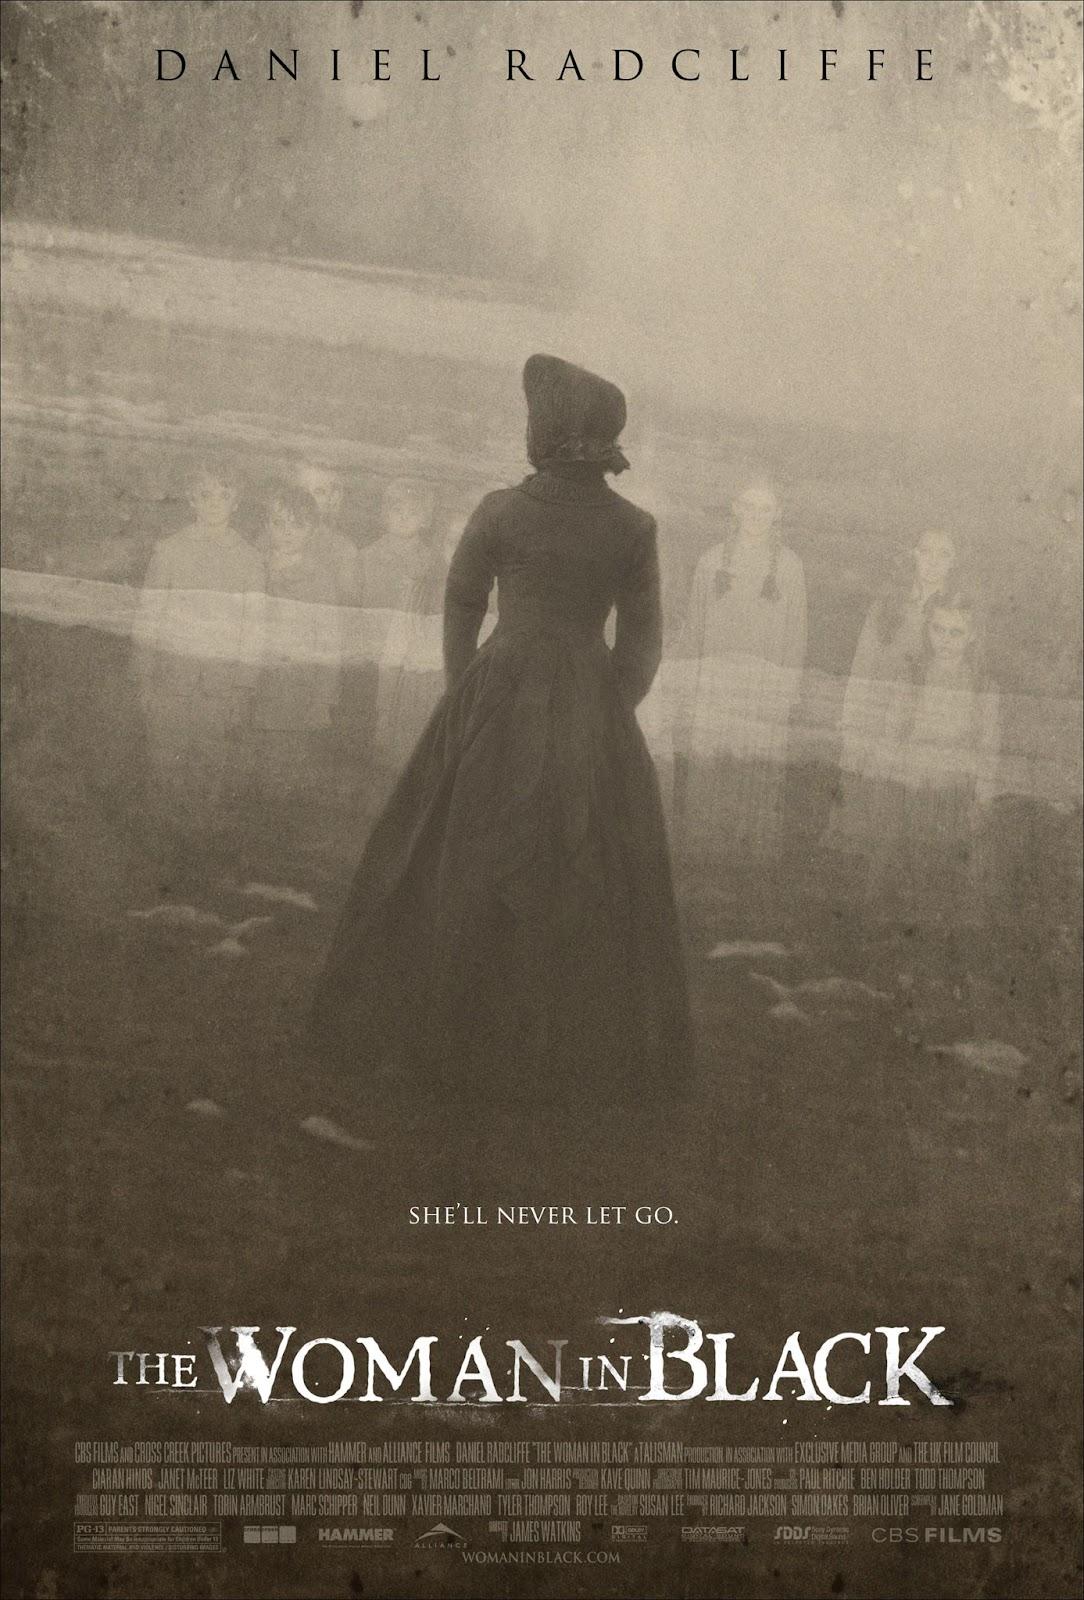 http://2.bp.blogspot.com/-dTFhl6ZiE1M/TzIHDVzcPFI/AAAAAAAAAHE/bY5KSyvIH34/s1600/the_woman_in_black_poster.jpg